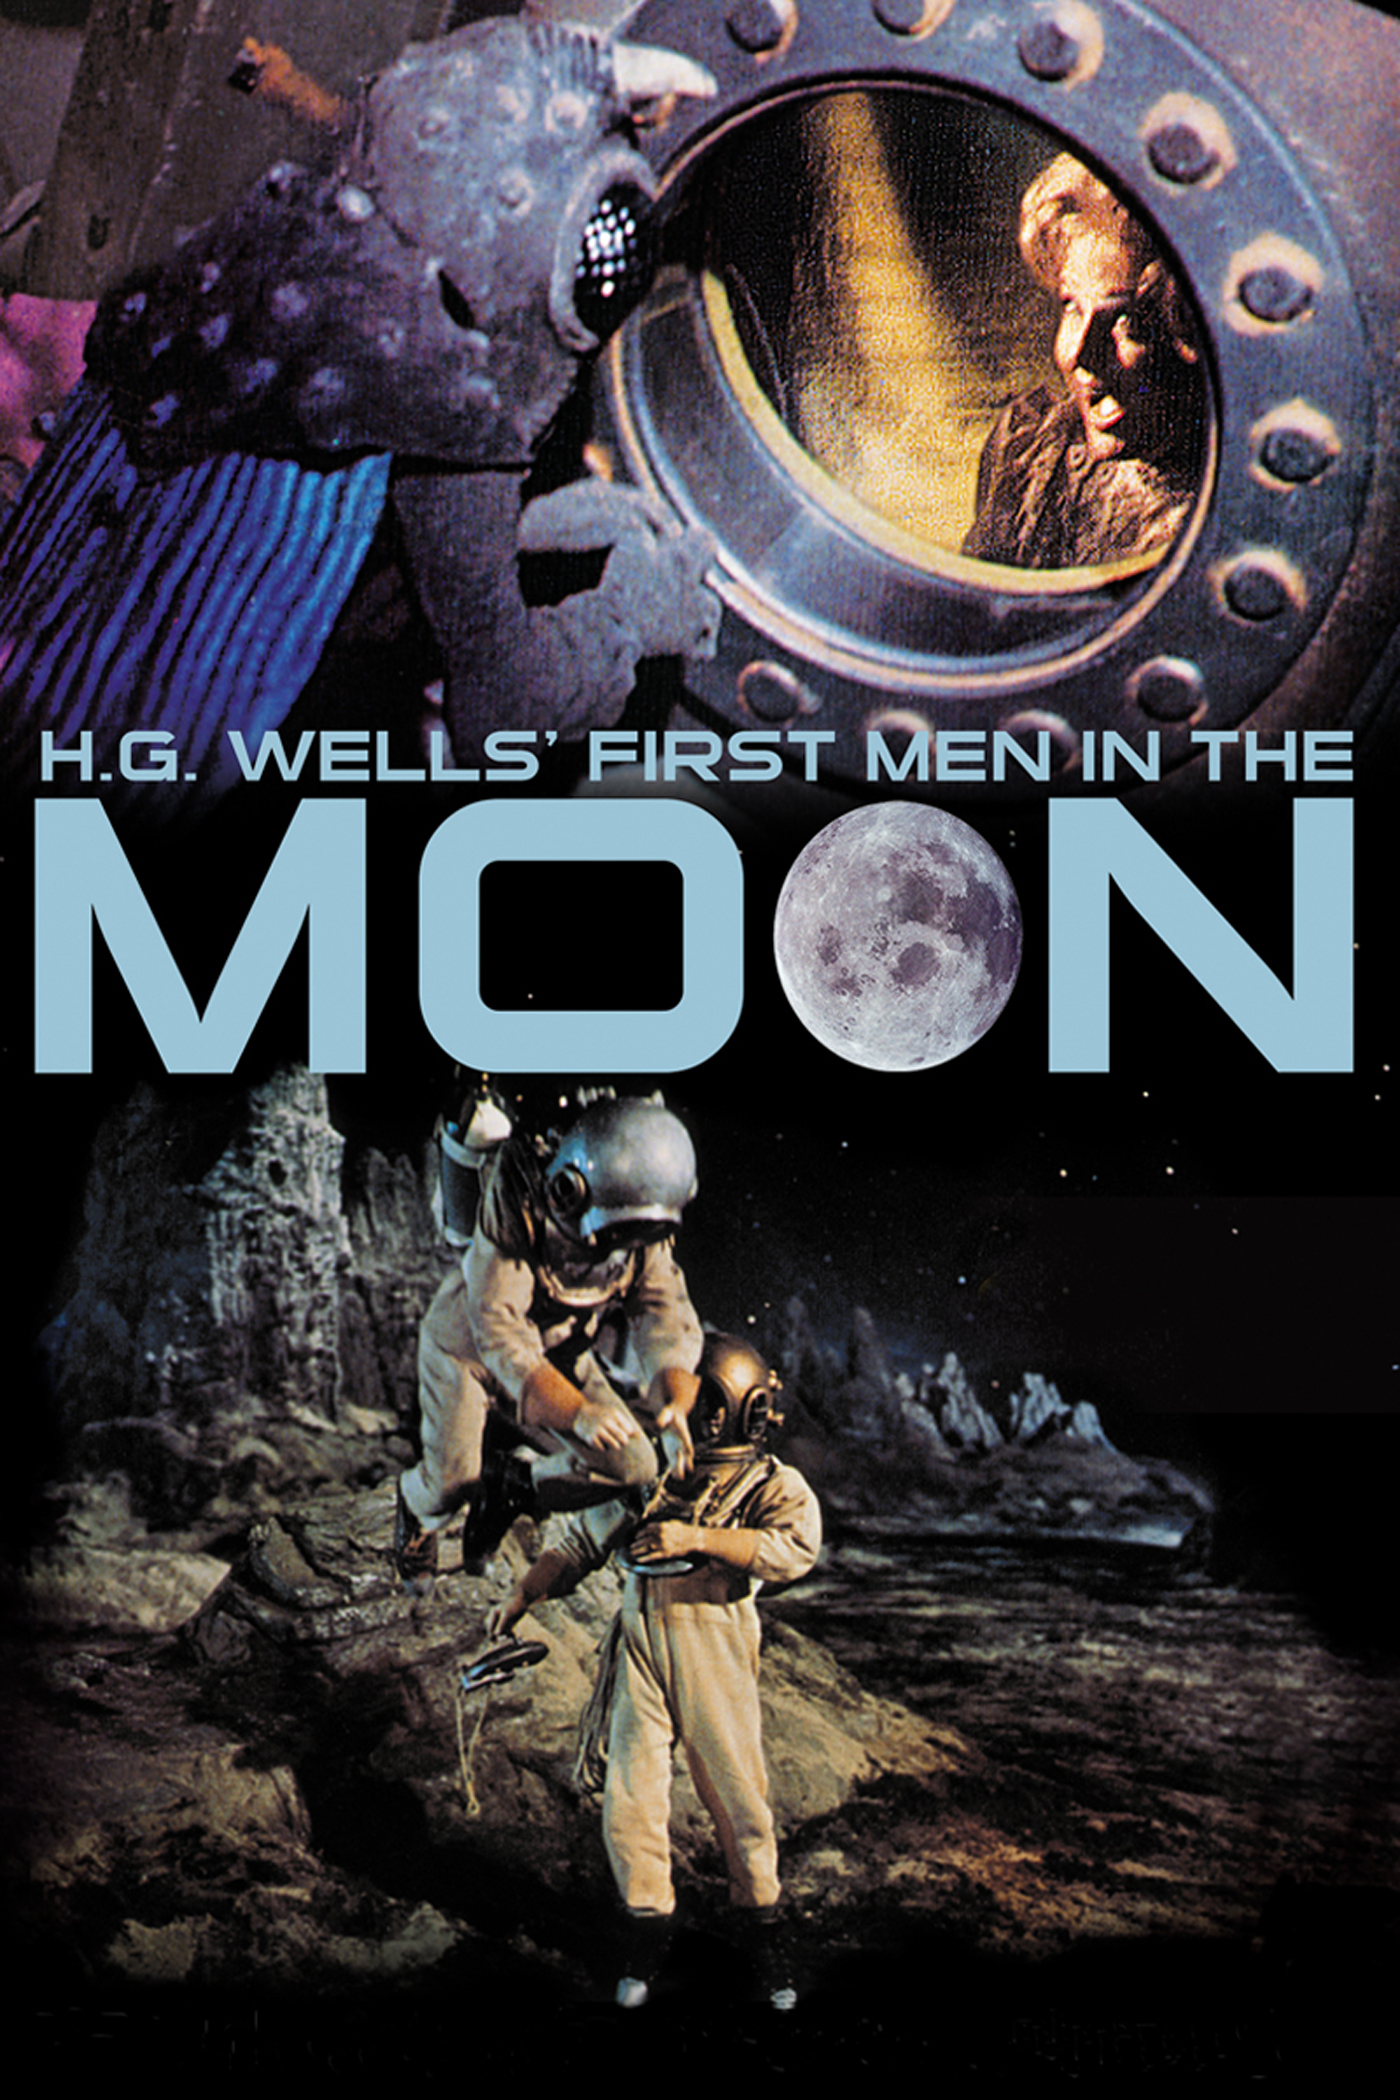 Capa de filme - First Men in the Moon